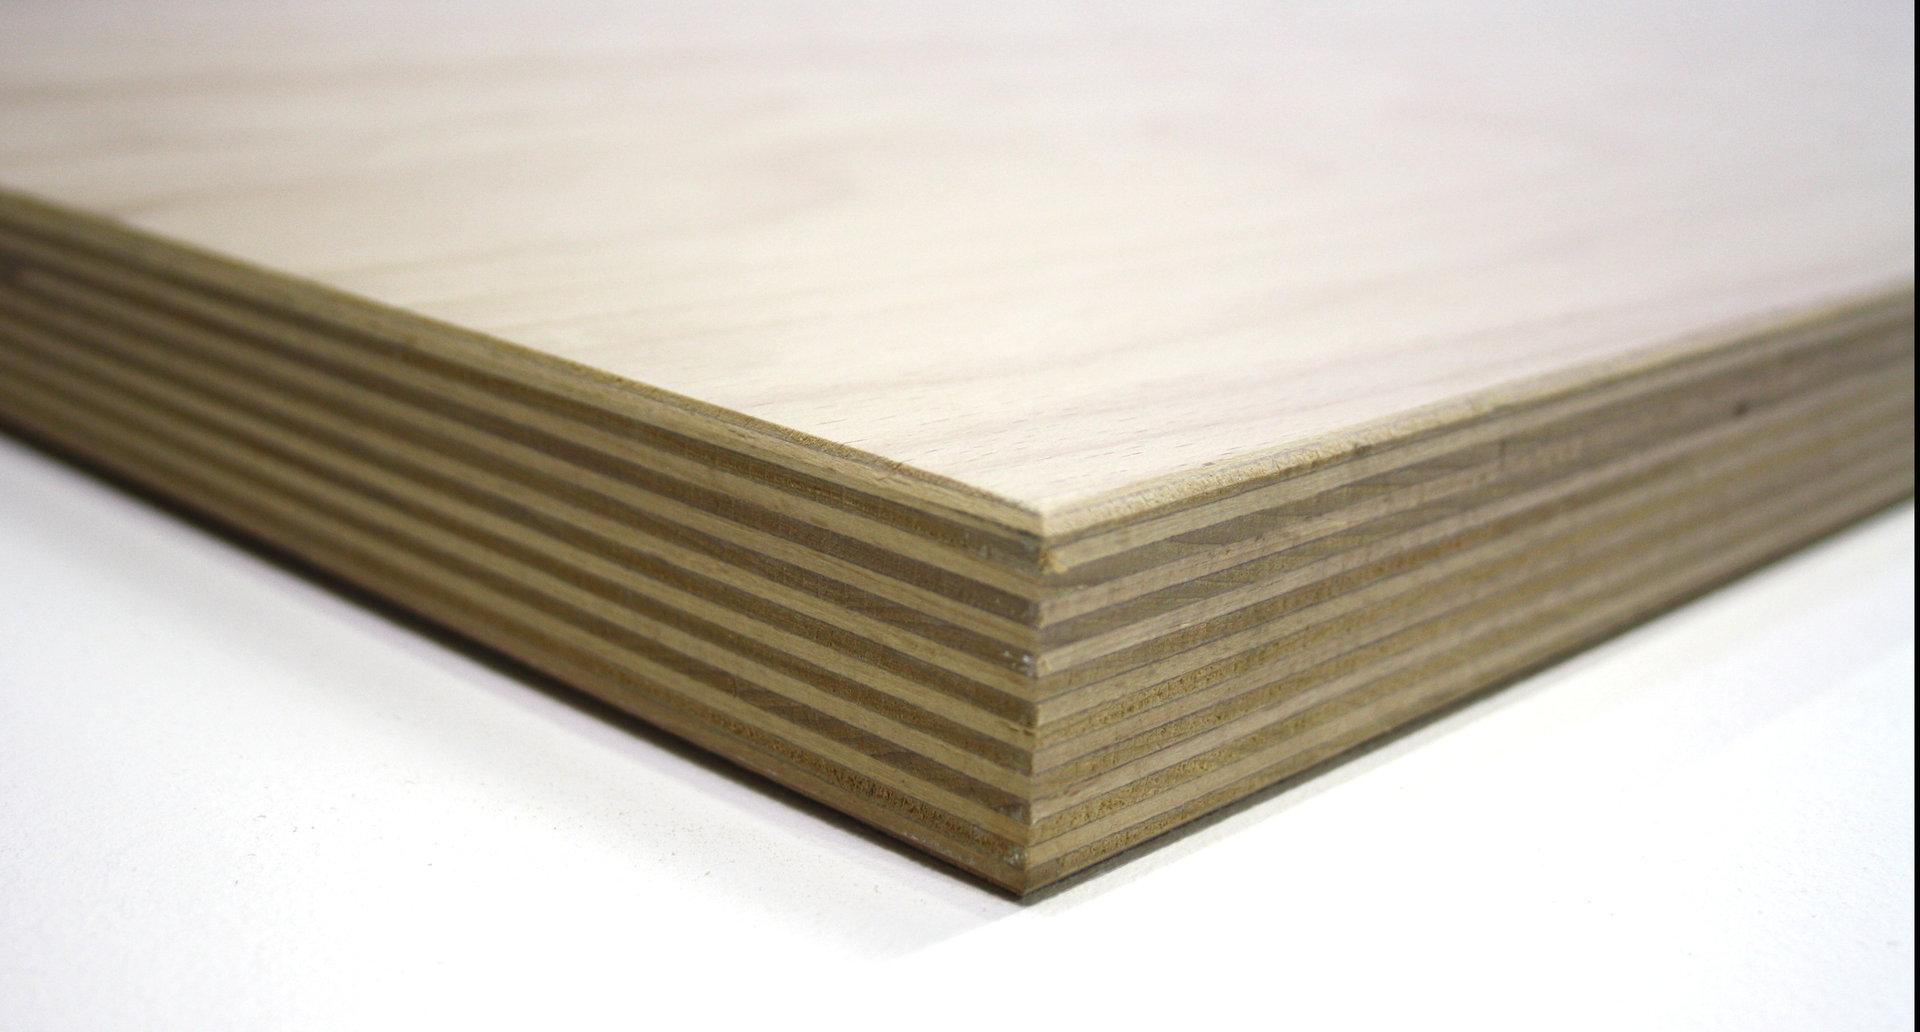 schichtholzplatten fachhandel f r federholzleisten zubeh r lattenrost. Black Bedroom Furniture Sets. Home Design Ideas